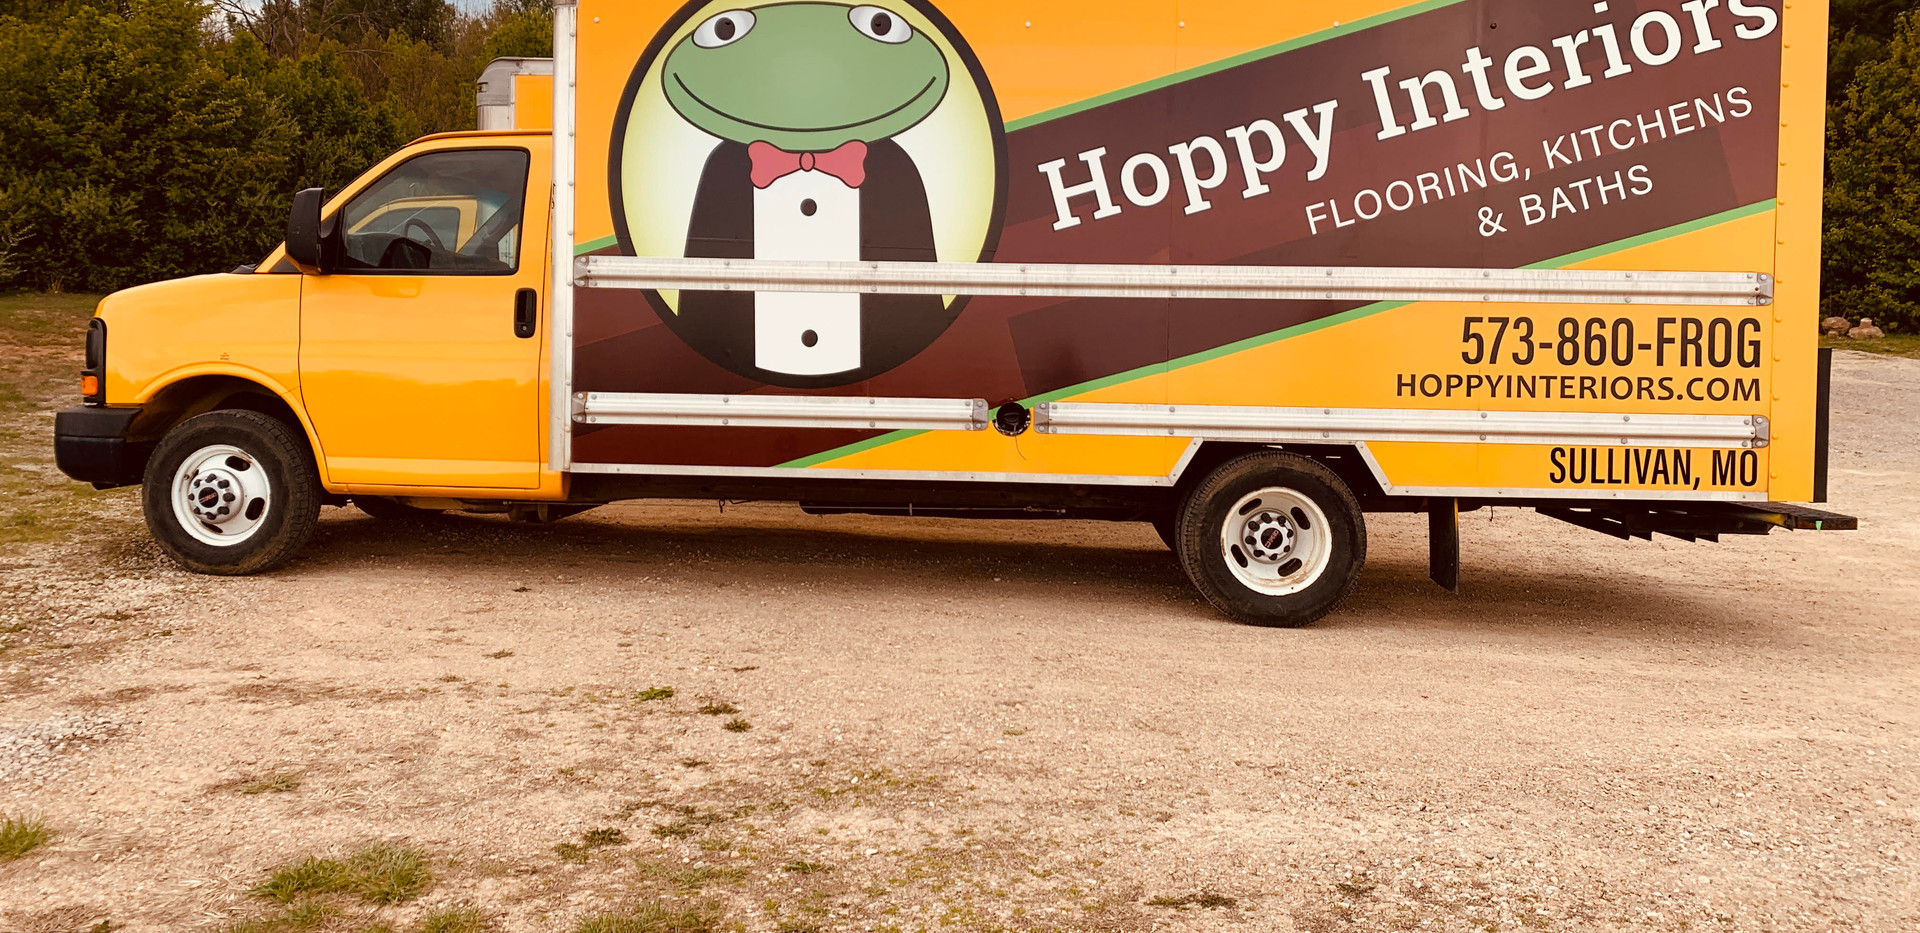 Hoppy Interiors Truck Wrap